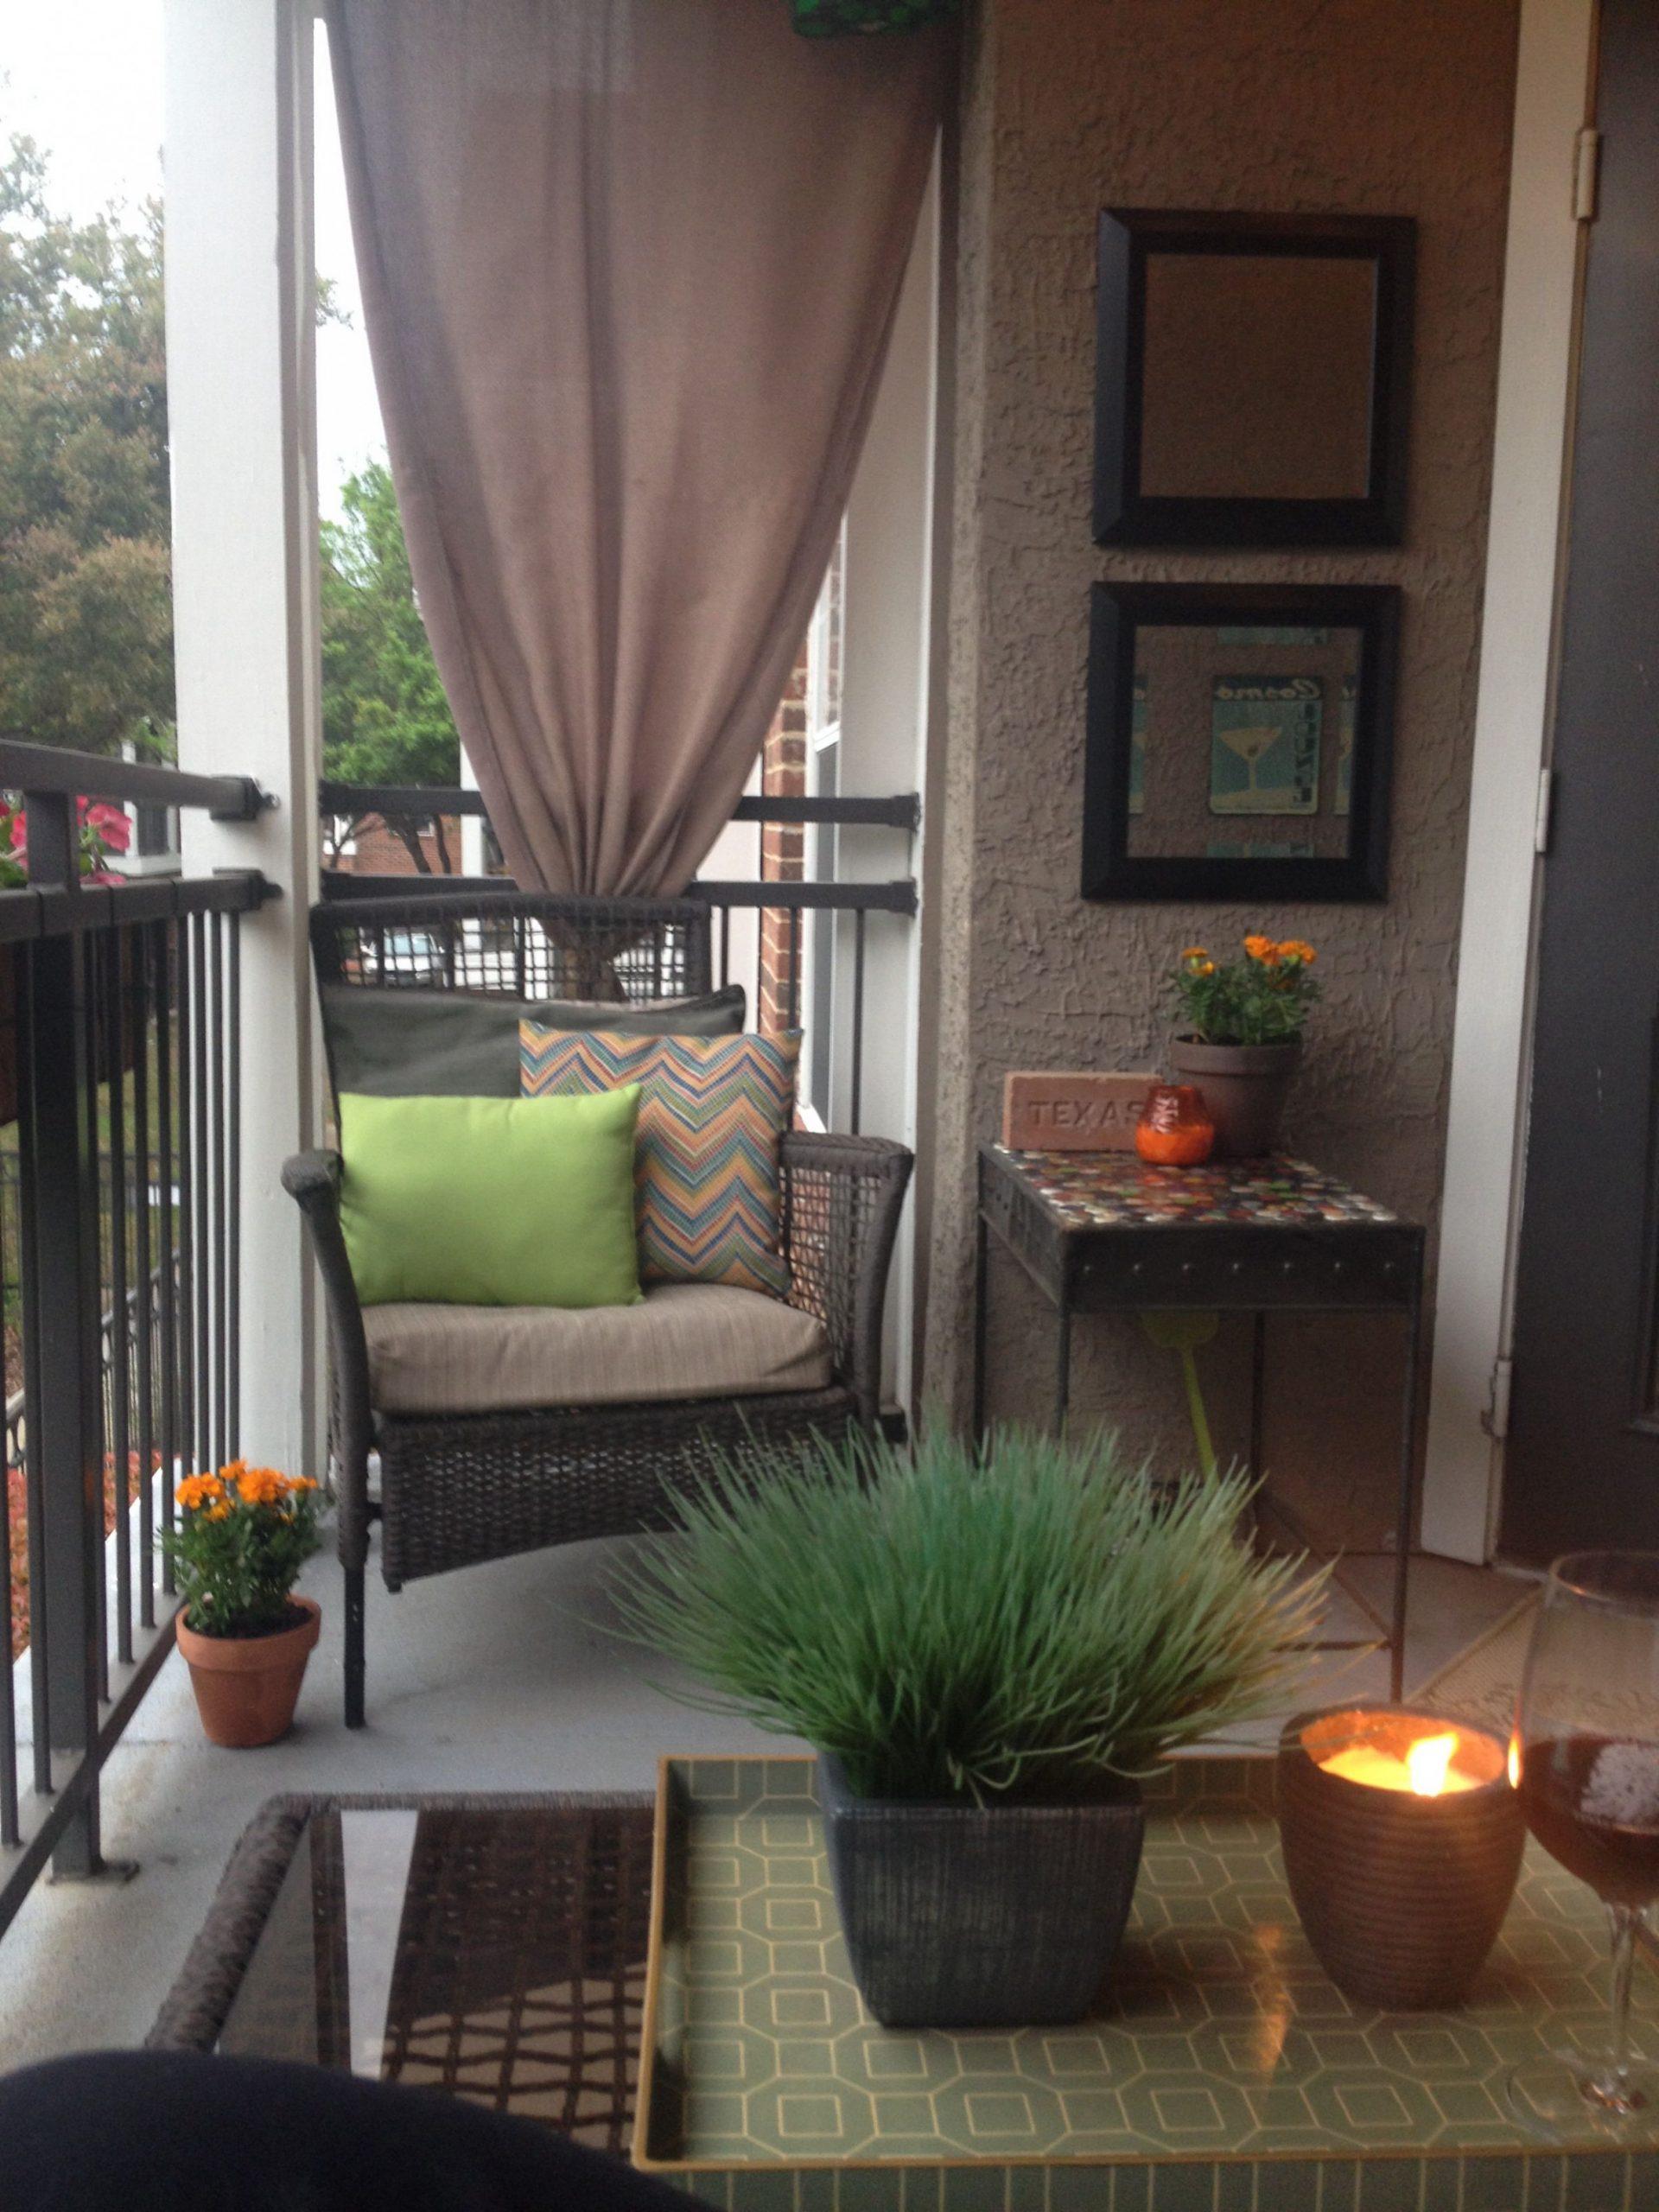 Patio, apartment patio, patio decor  Apartment patio decor, Small  - Decorating Apartment Balcony Ideas